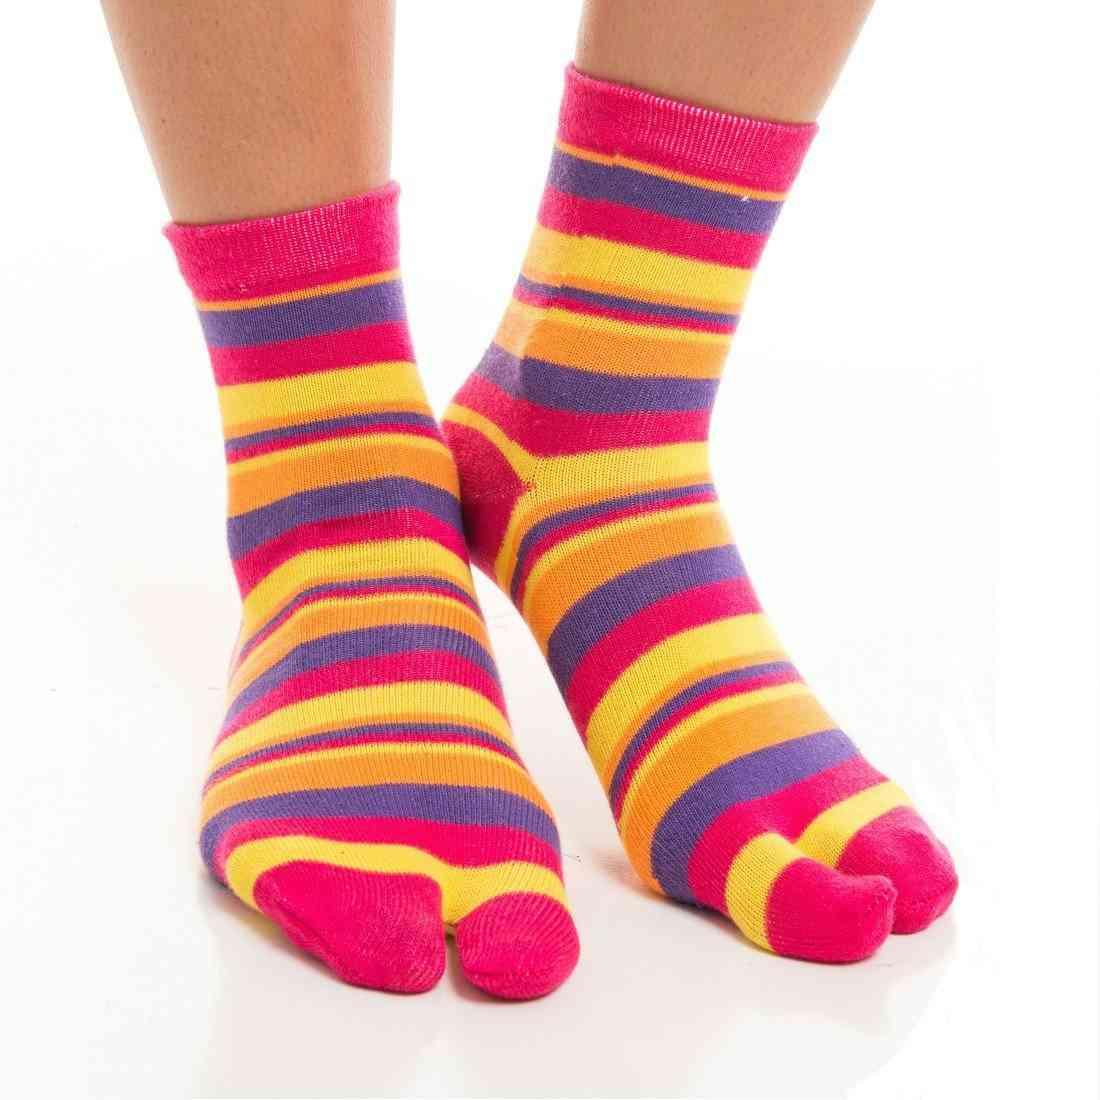 Flip Flop Socks - Pink, Yellow Striped